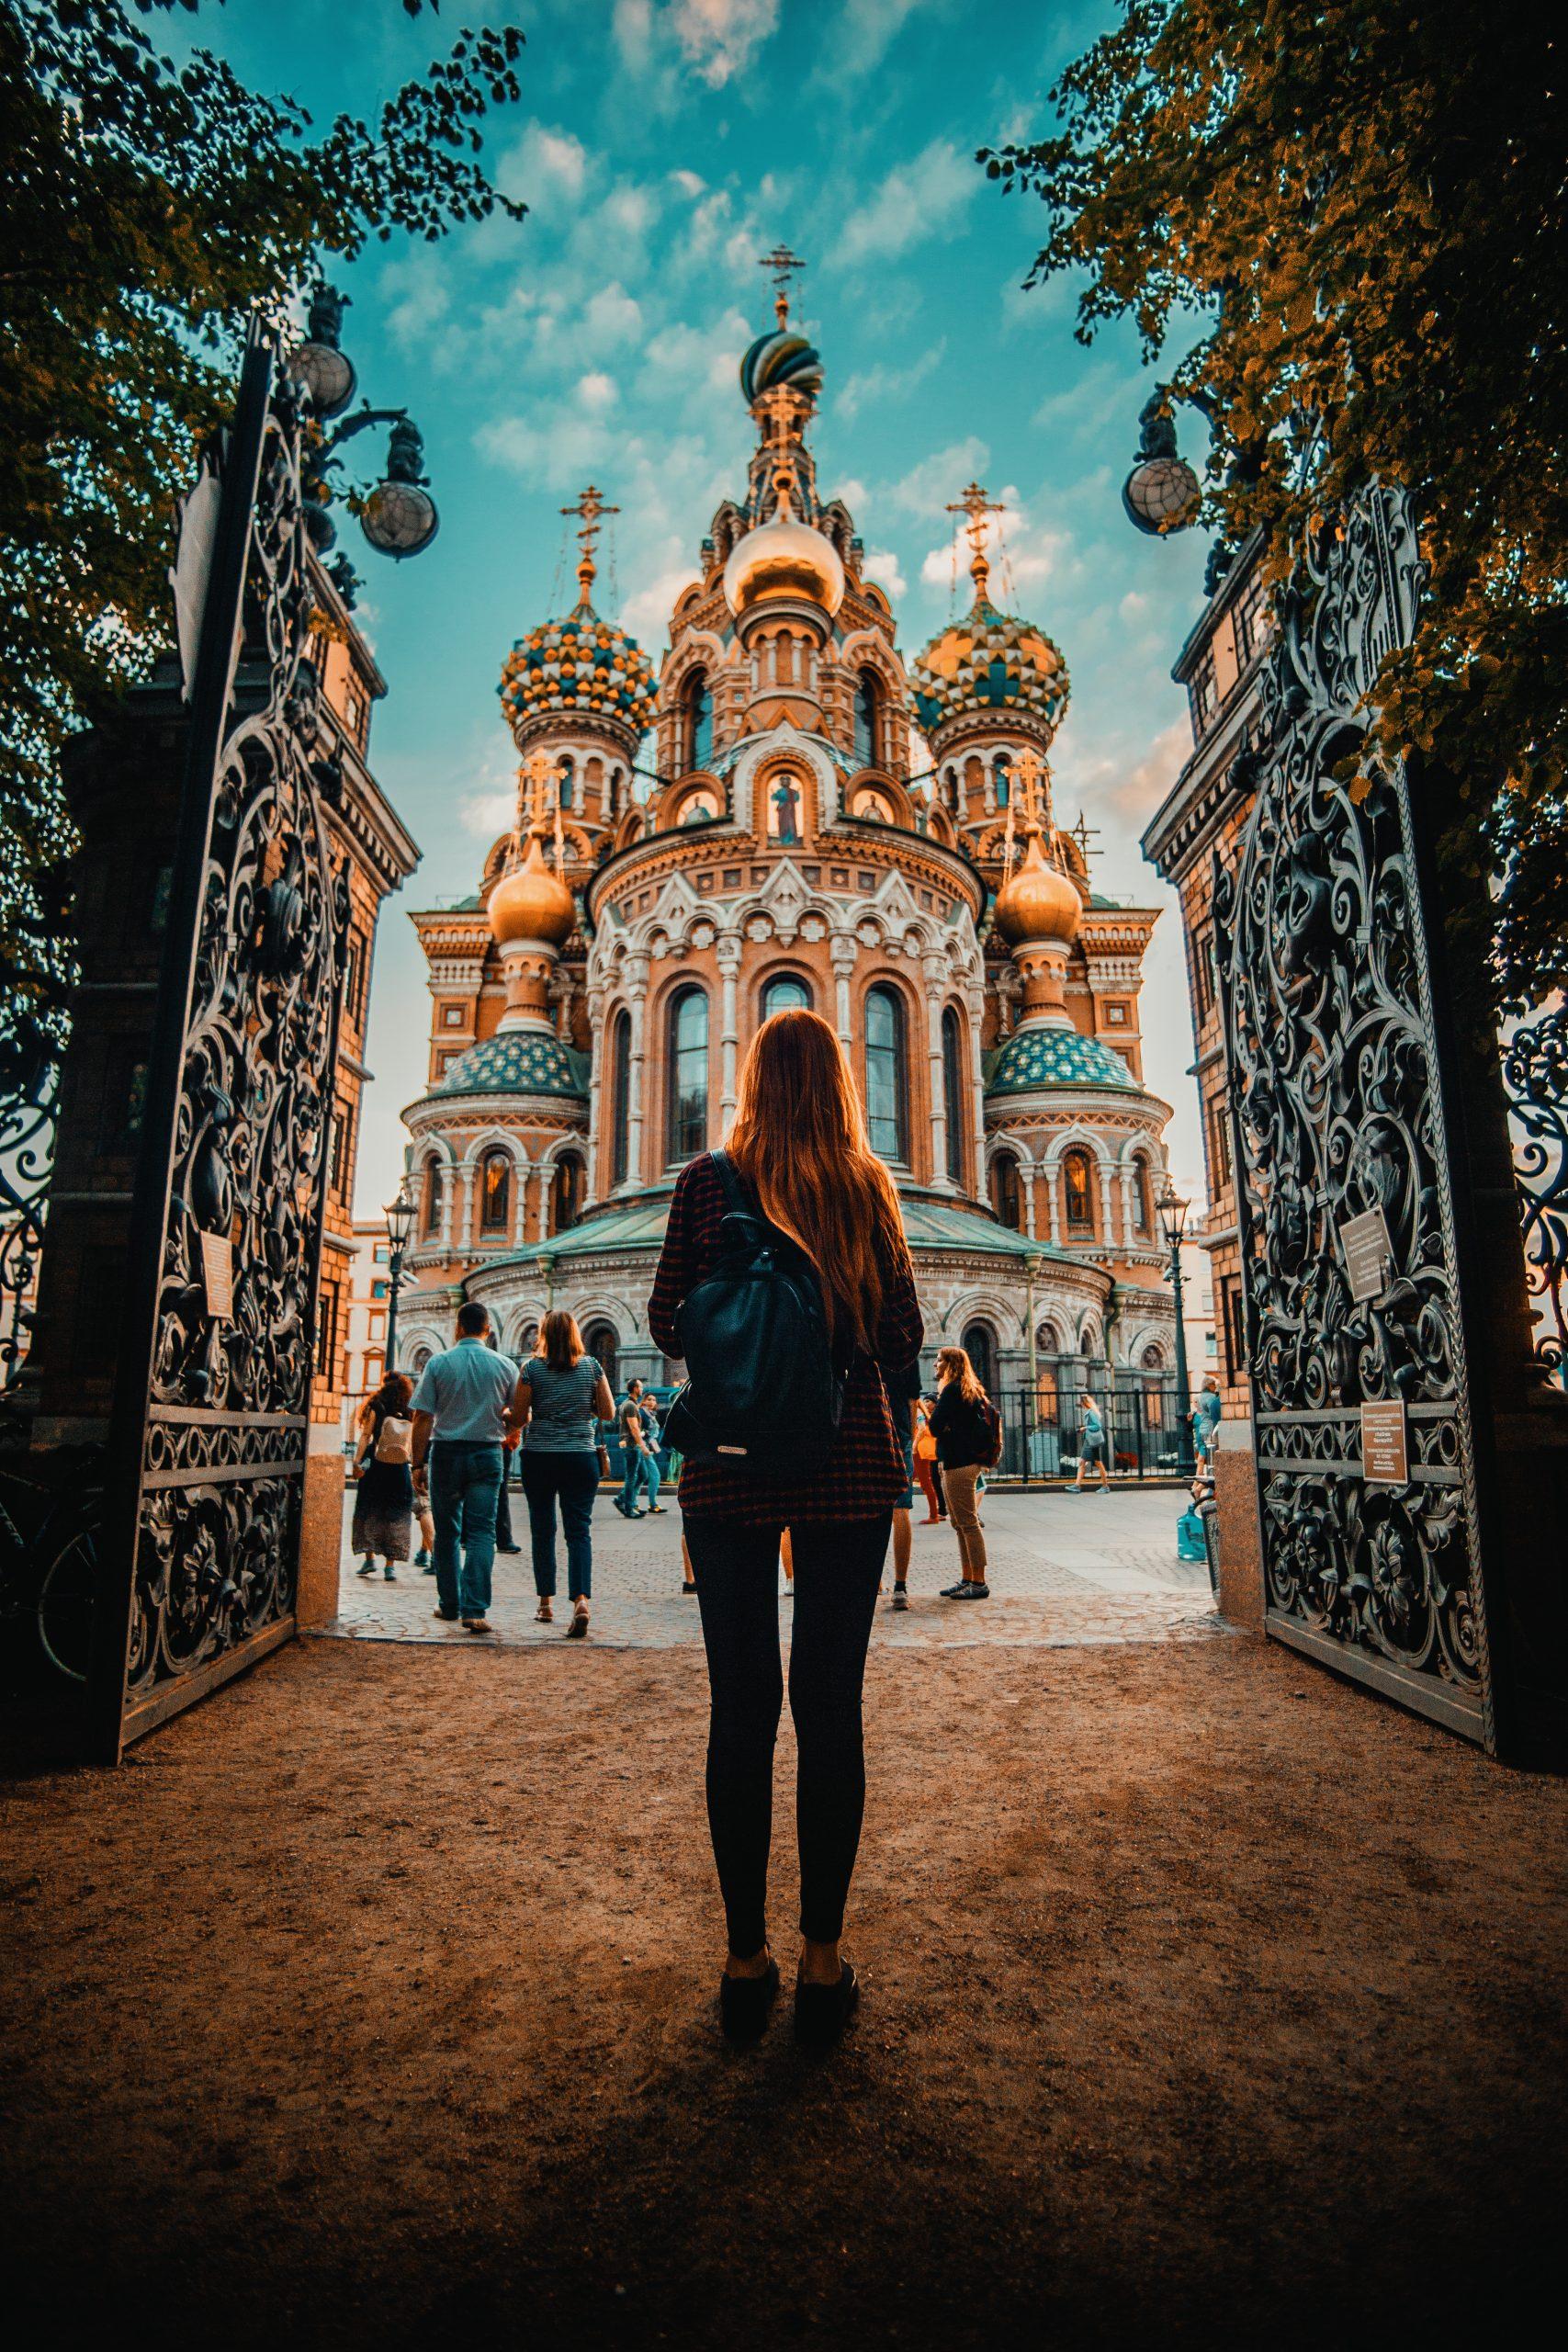 Saint Petersburg Chuch